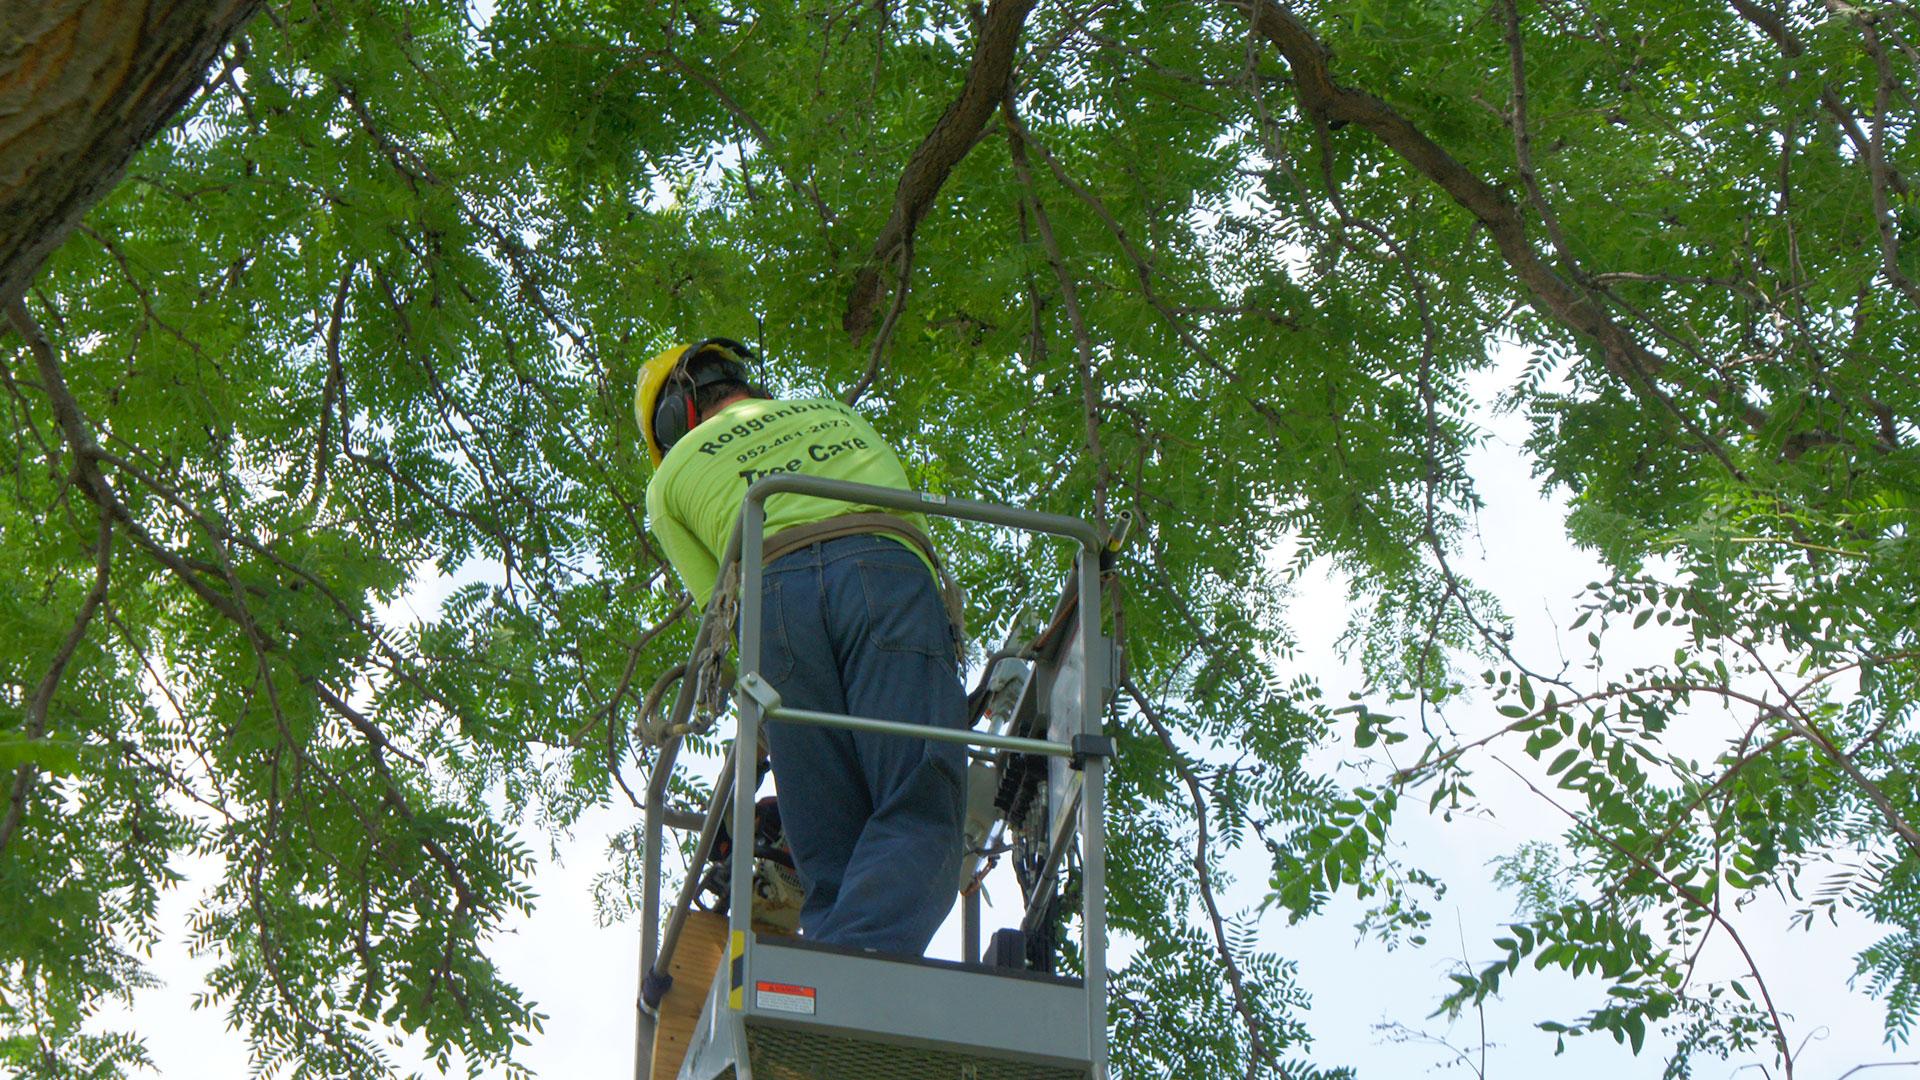 Roggenbuck Tree Care staff at work